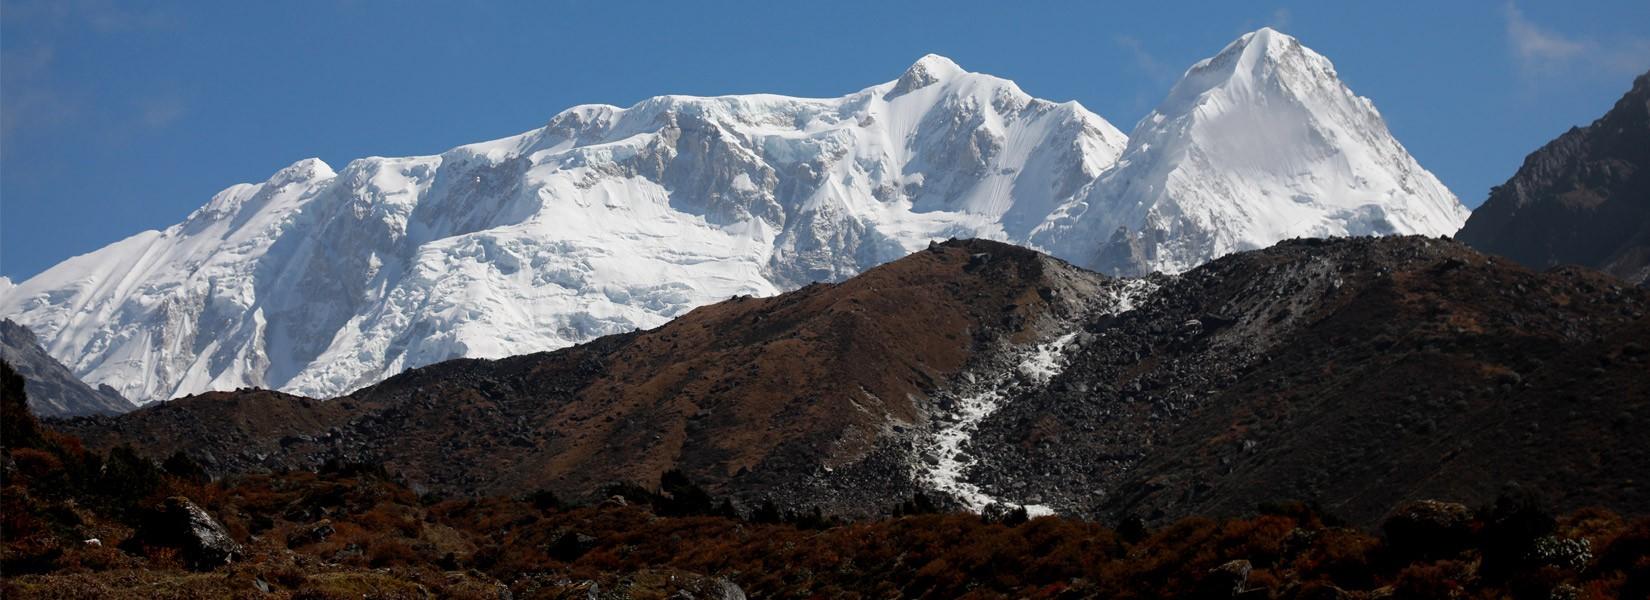 Mt. Kanchenjunga range from Ramche